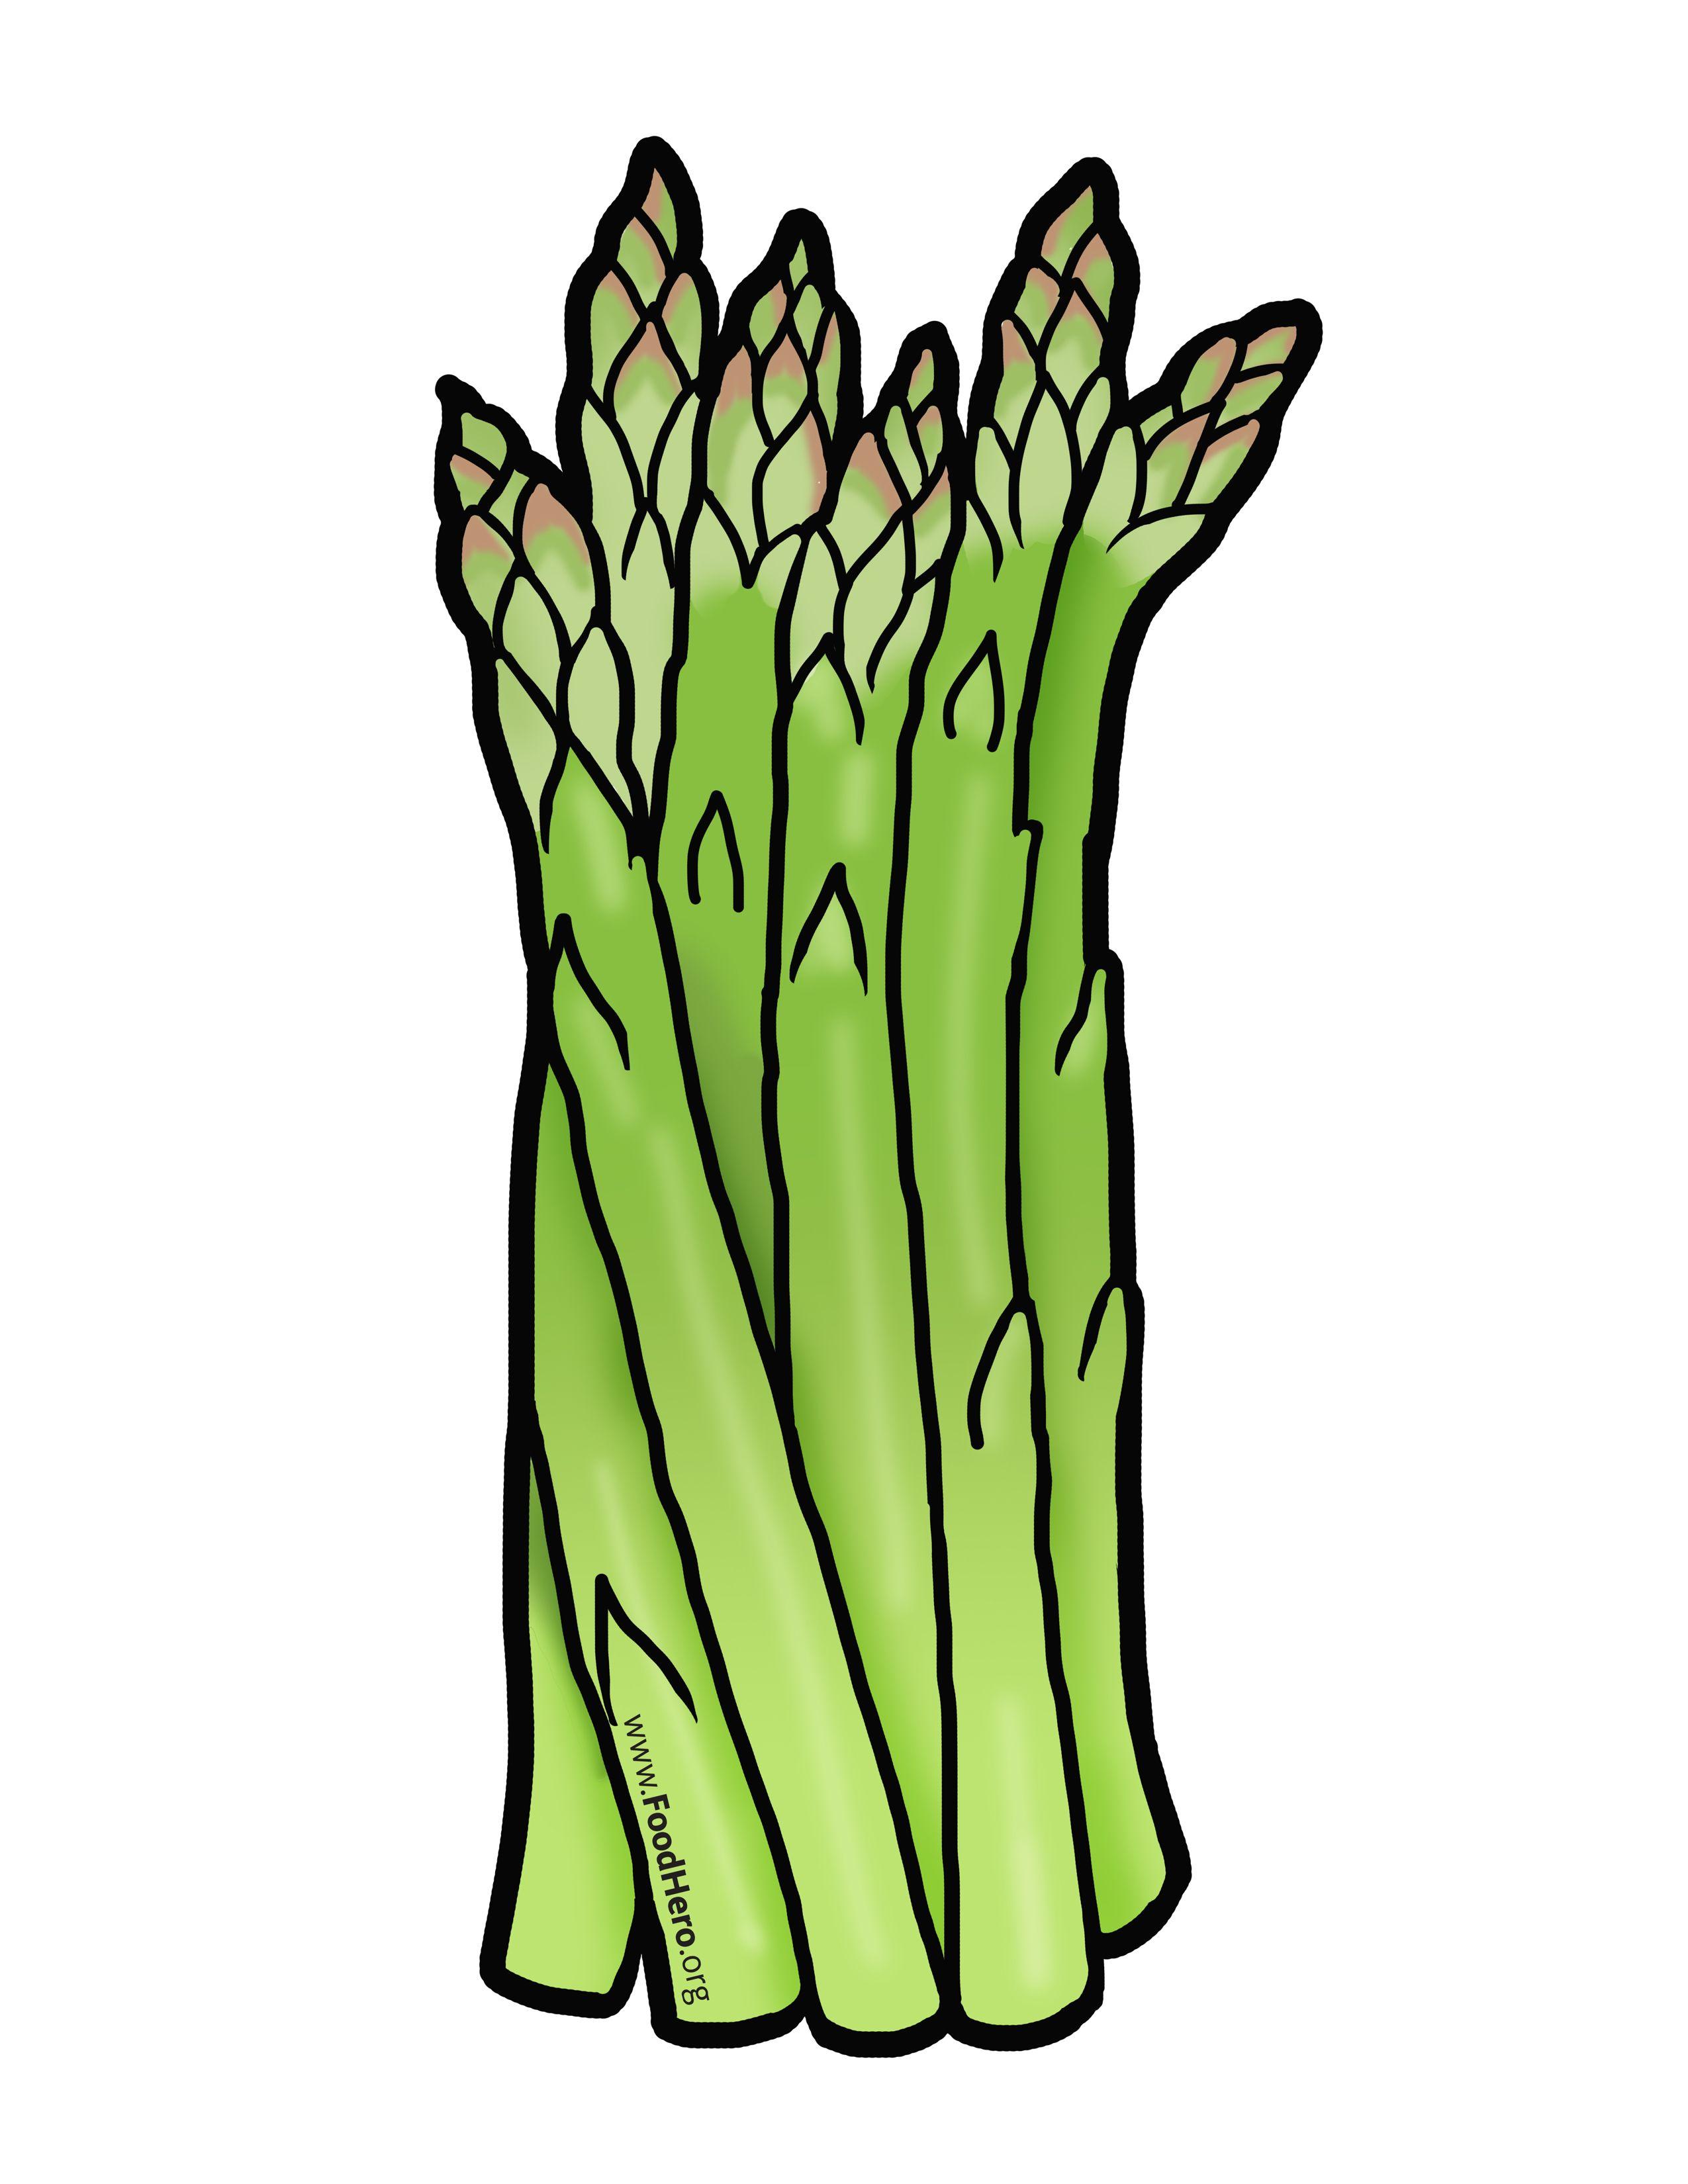 Asparagus illustration. #foodhero #bullentinboards #artwork.